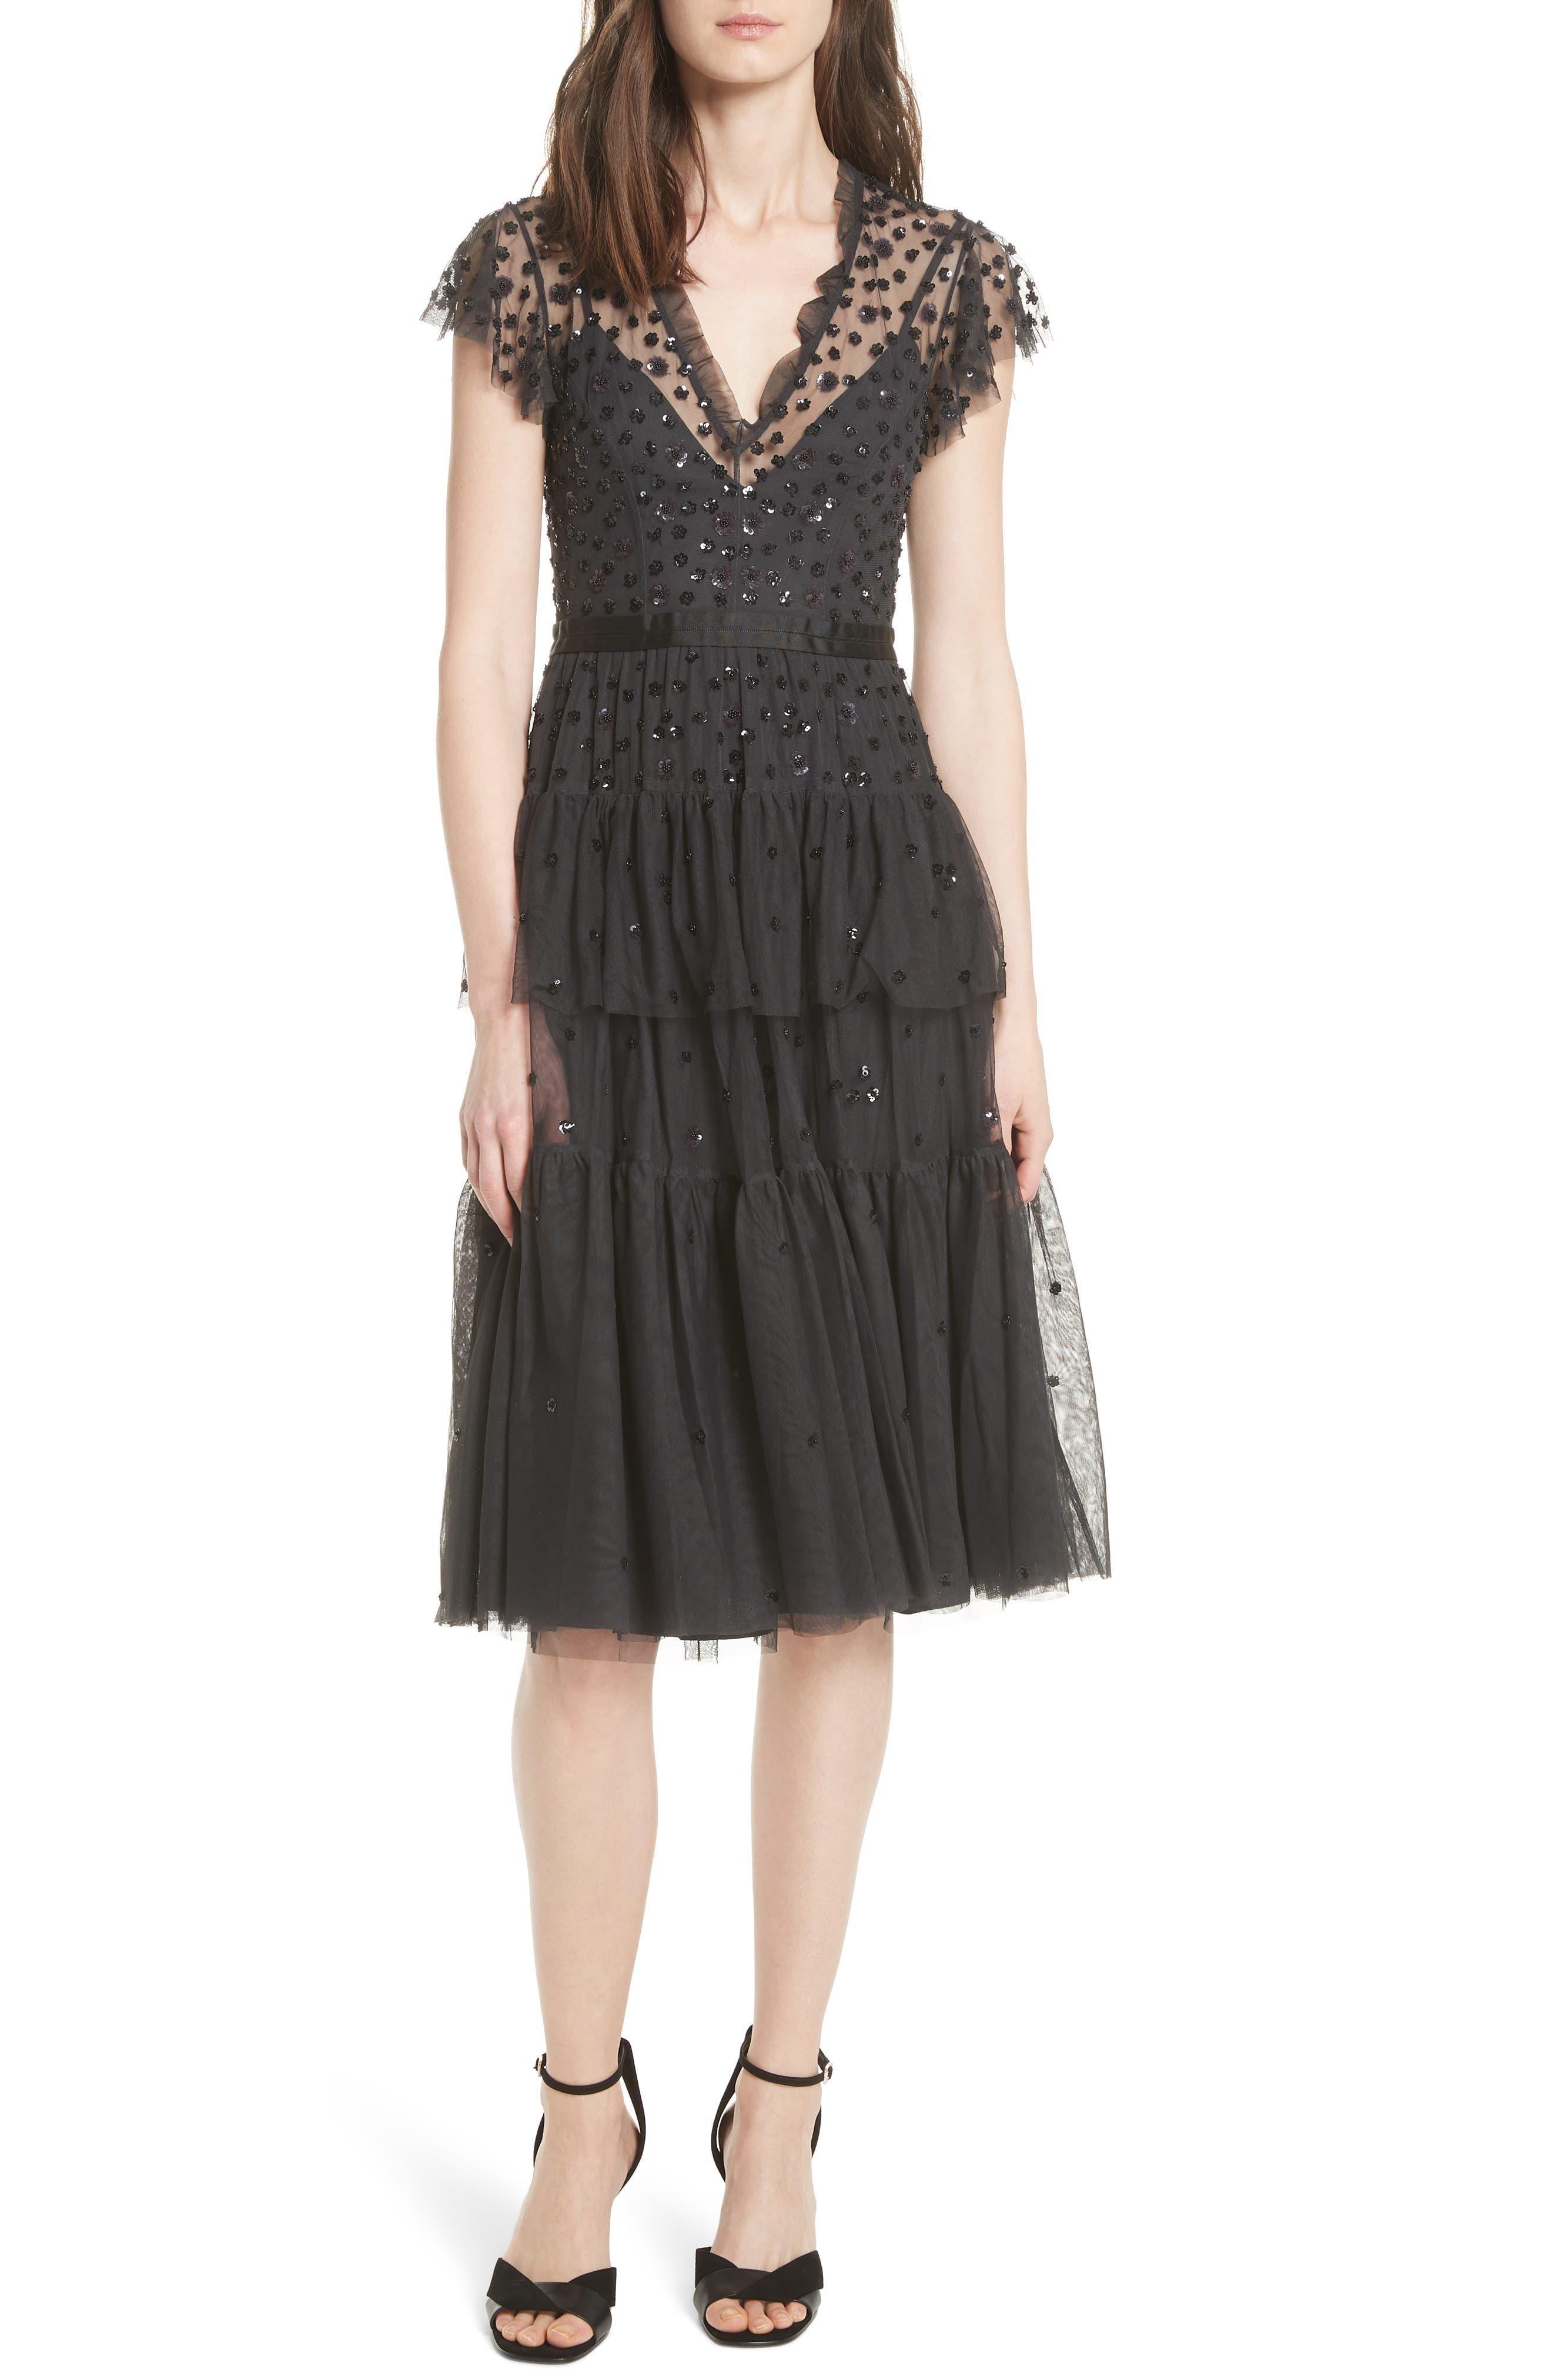 Mirage Sequin Dress,                             Main thumbnail 1, color,                             021